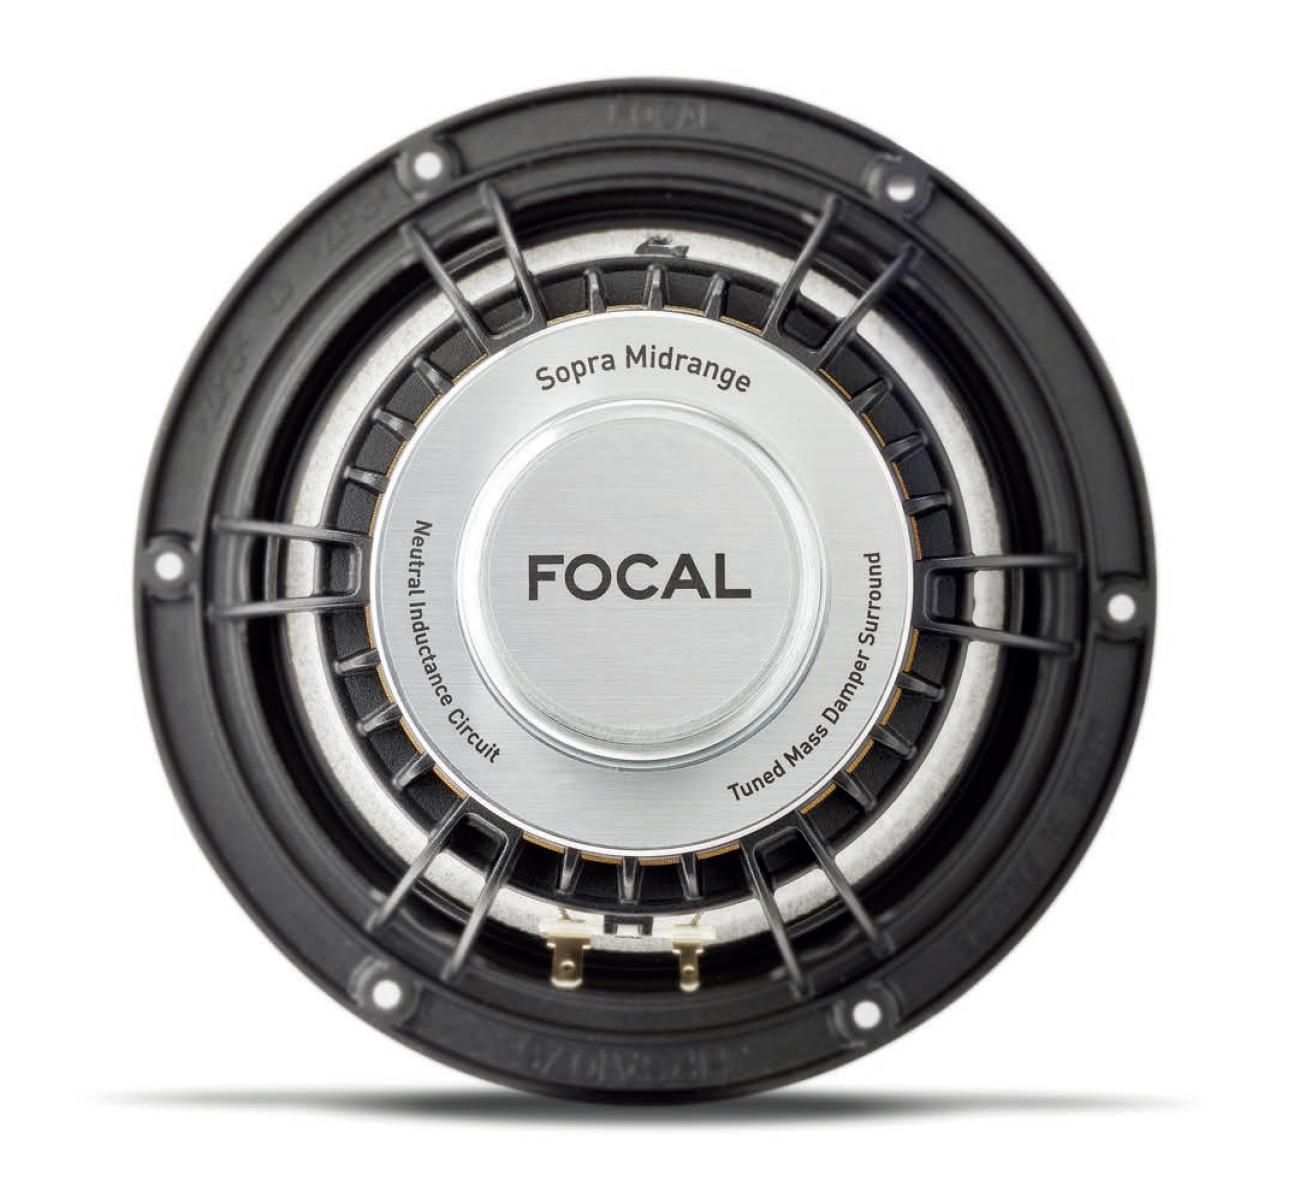 focal_sopra_no3-5.jpg